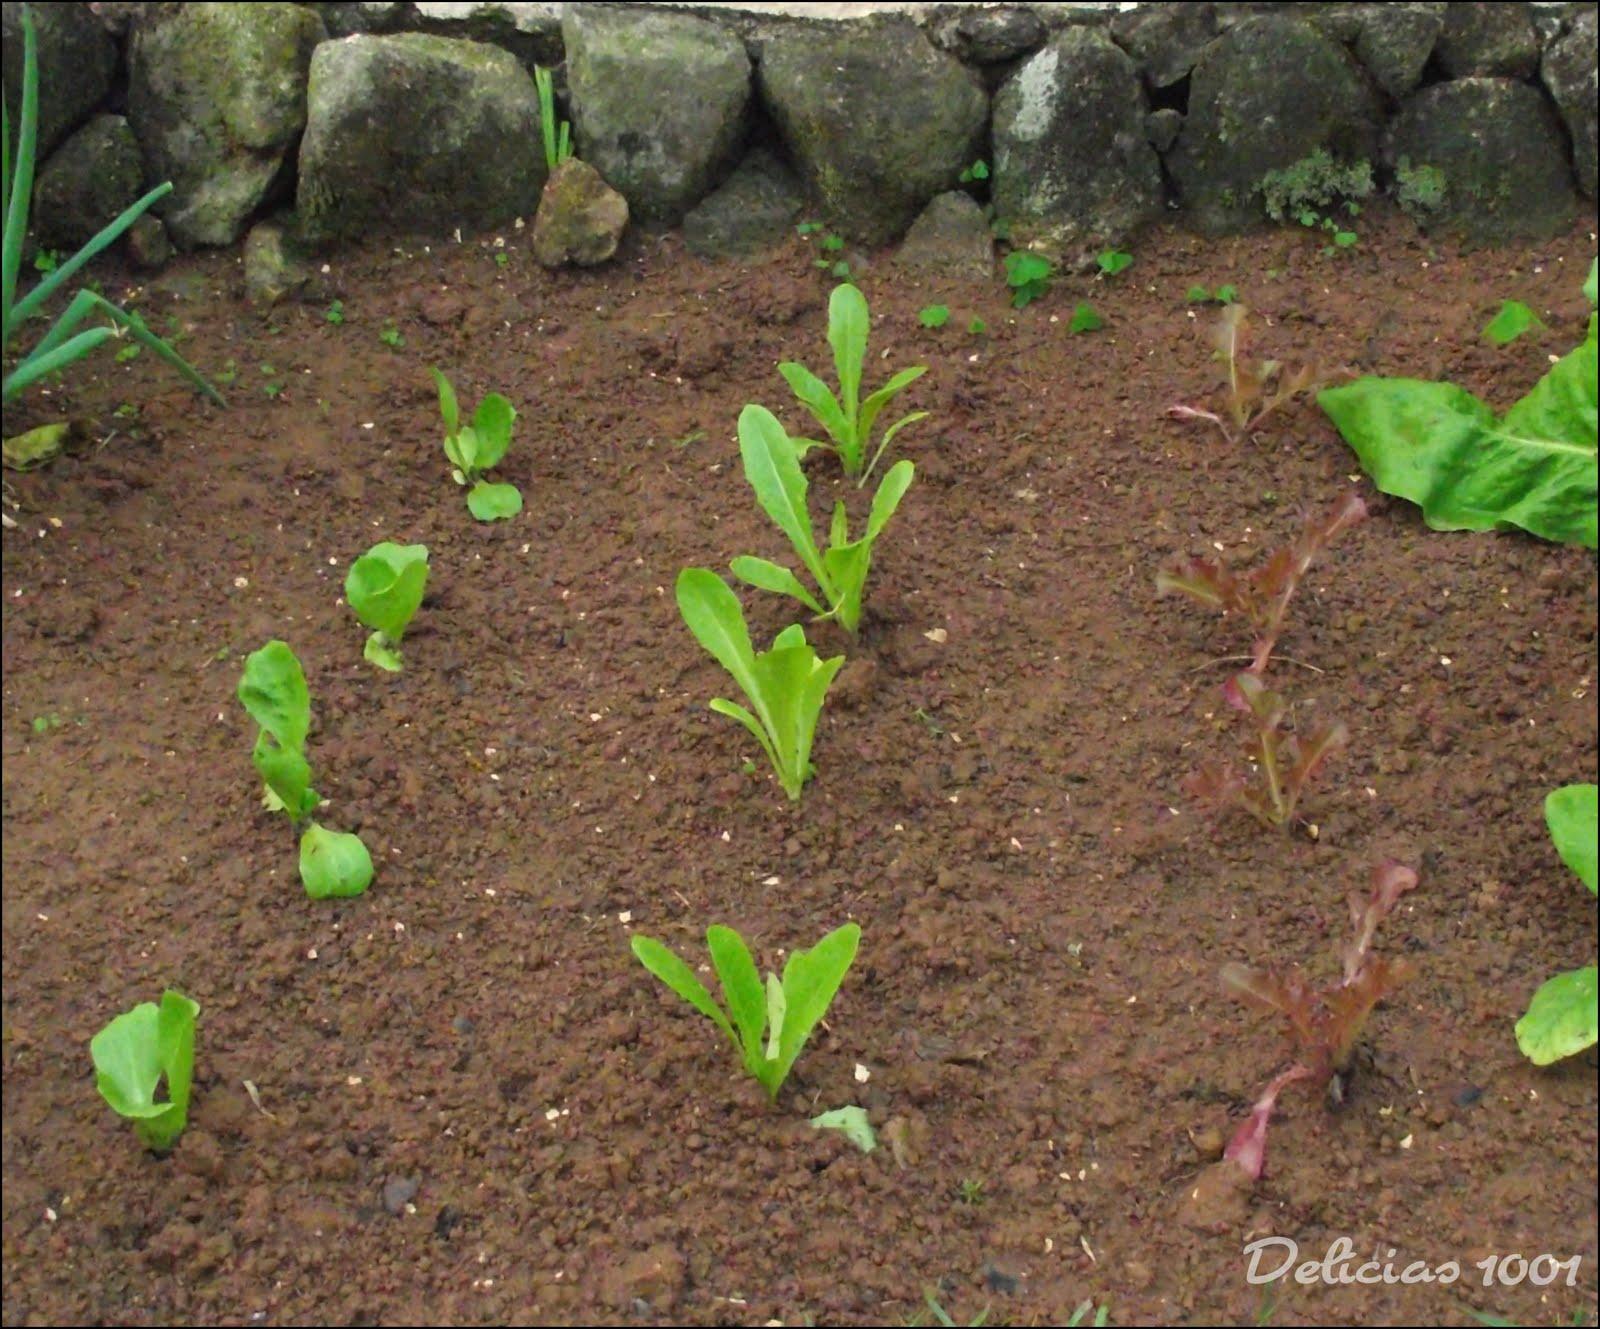 horta jardim e pomar:Meu pomar/horta/jardim: HORTALIÇAS – Delícias 1001Delícias 1001